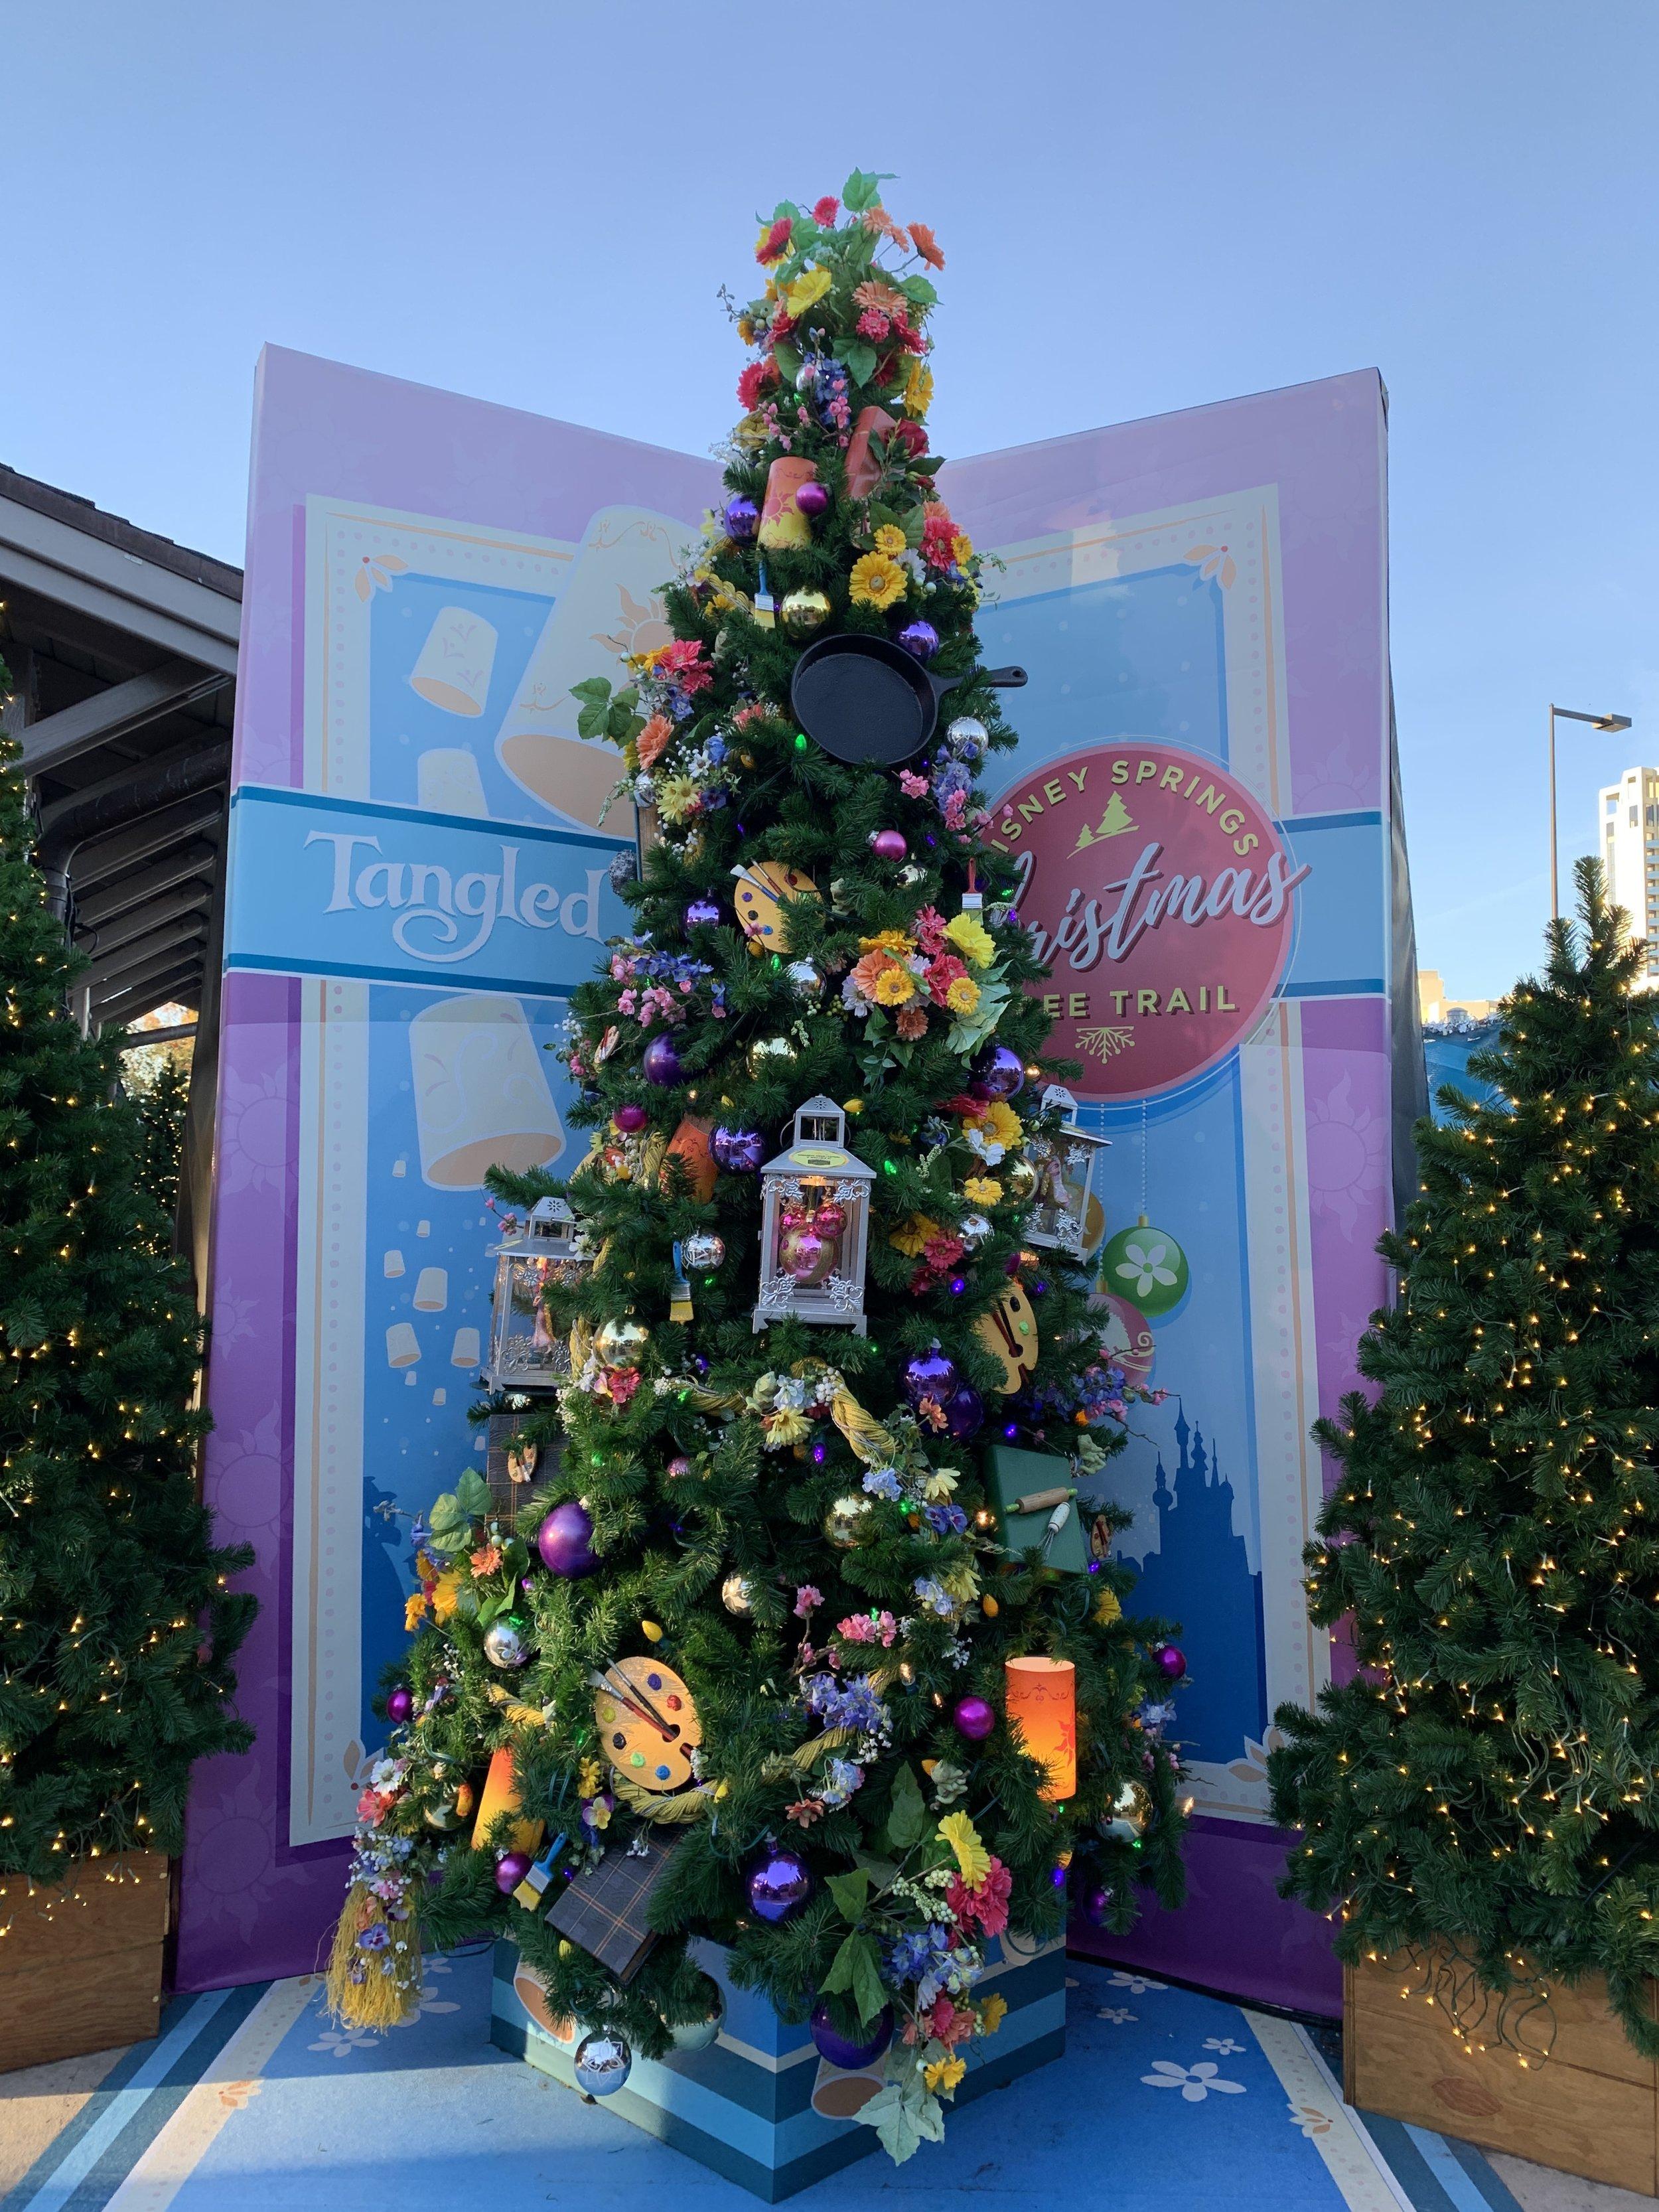 Tangled Christmas Tree. The cast iron skillet is genius!